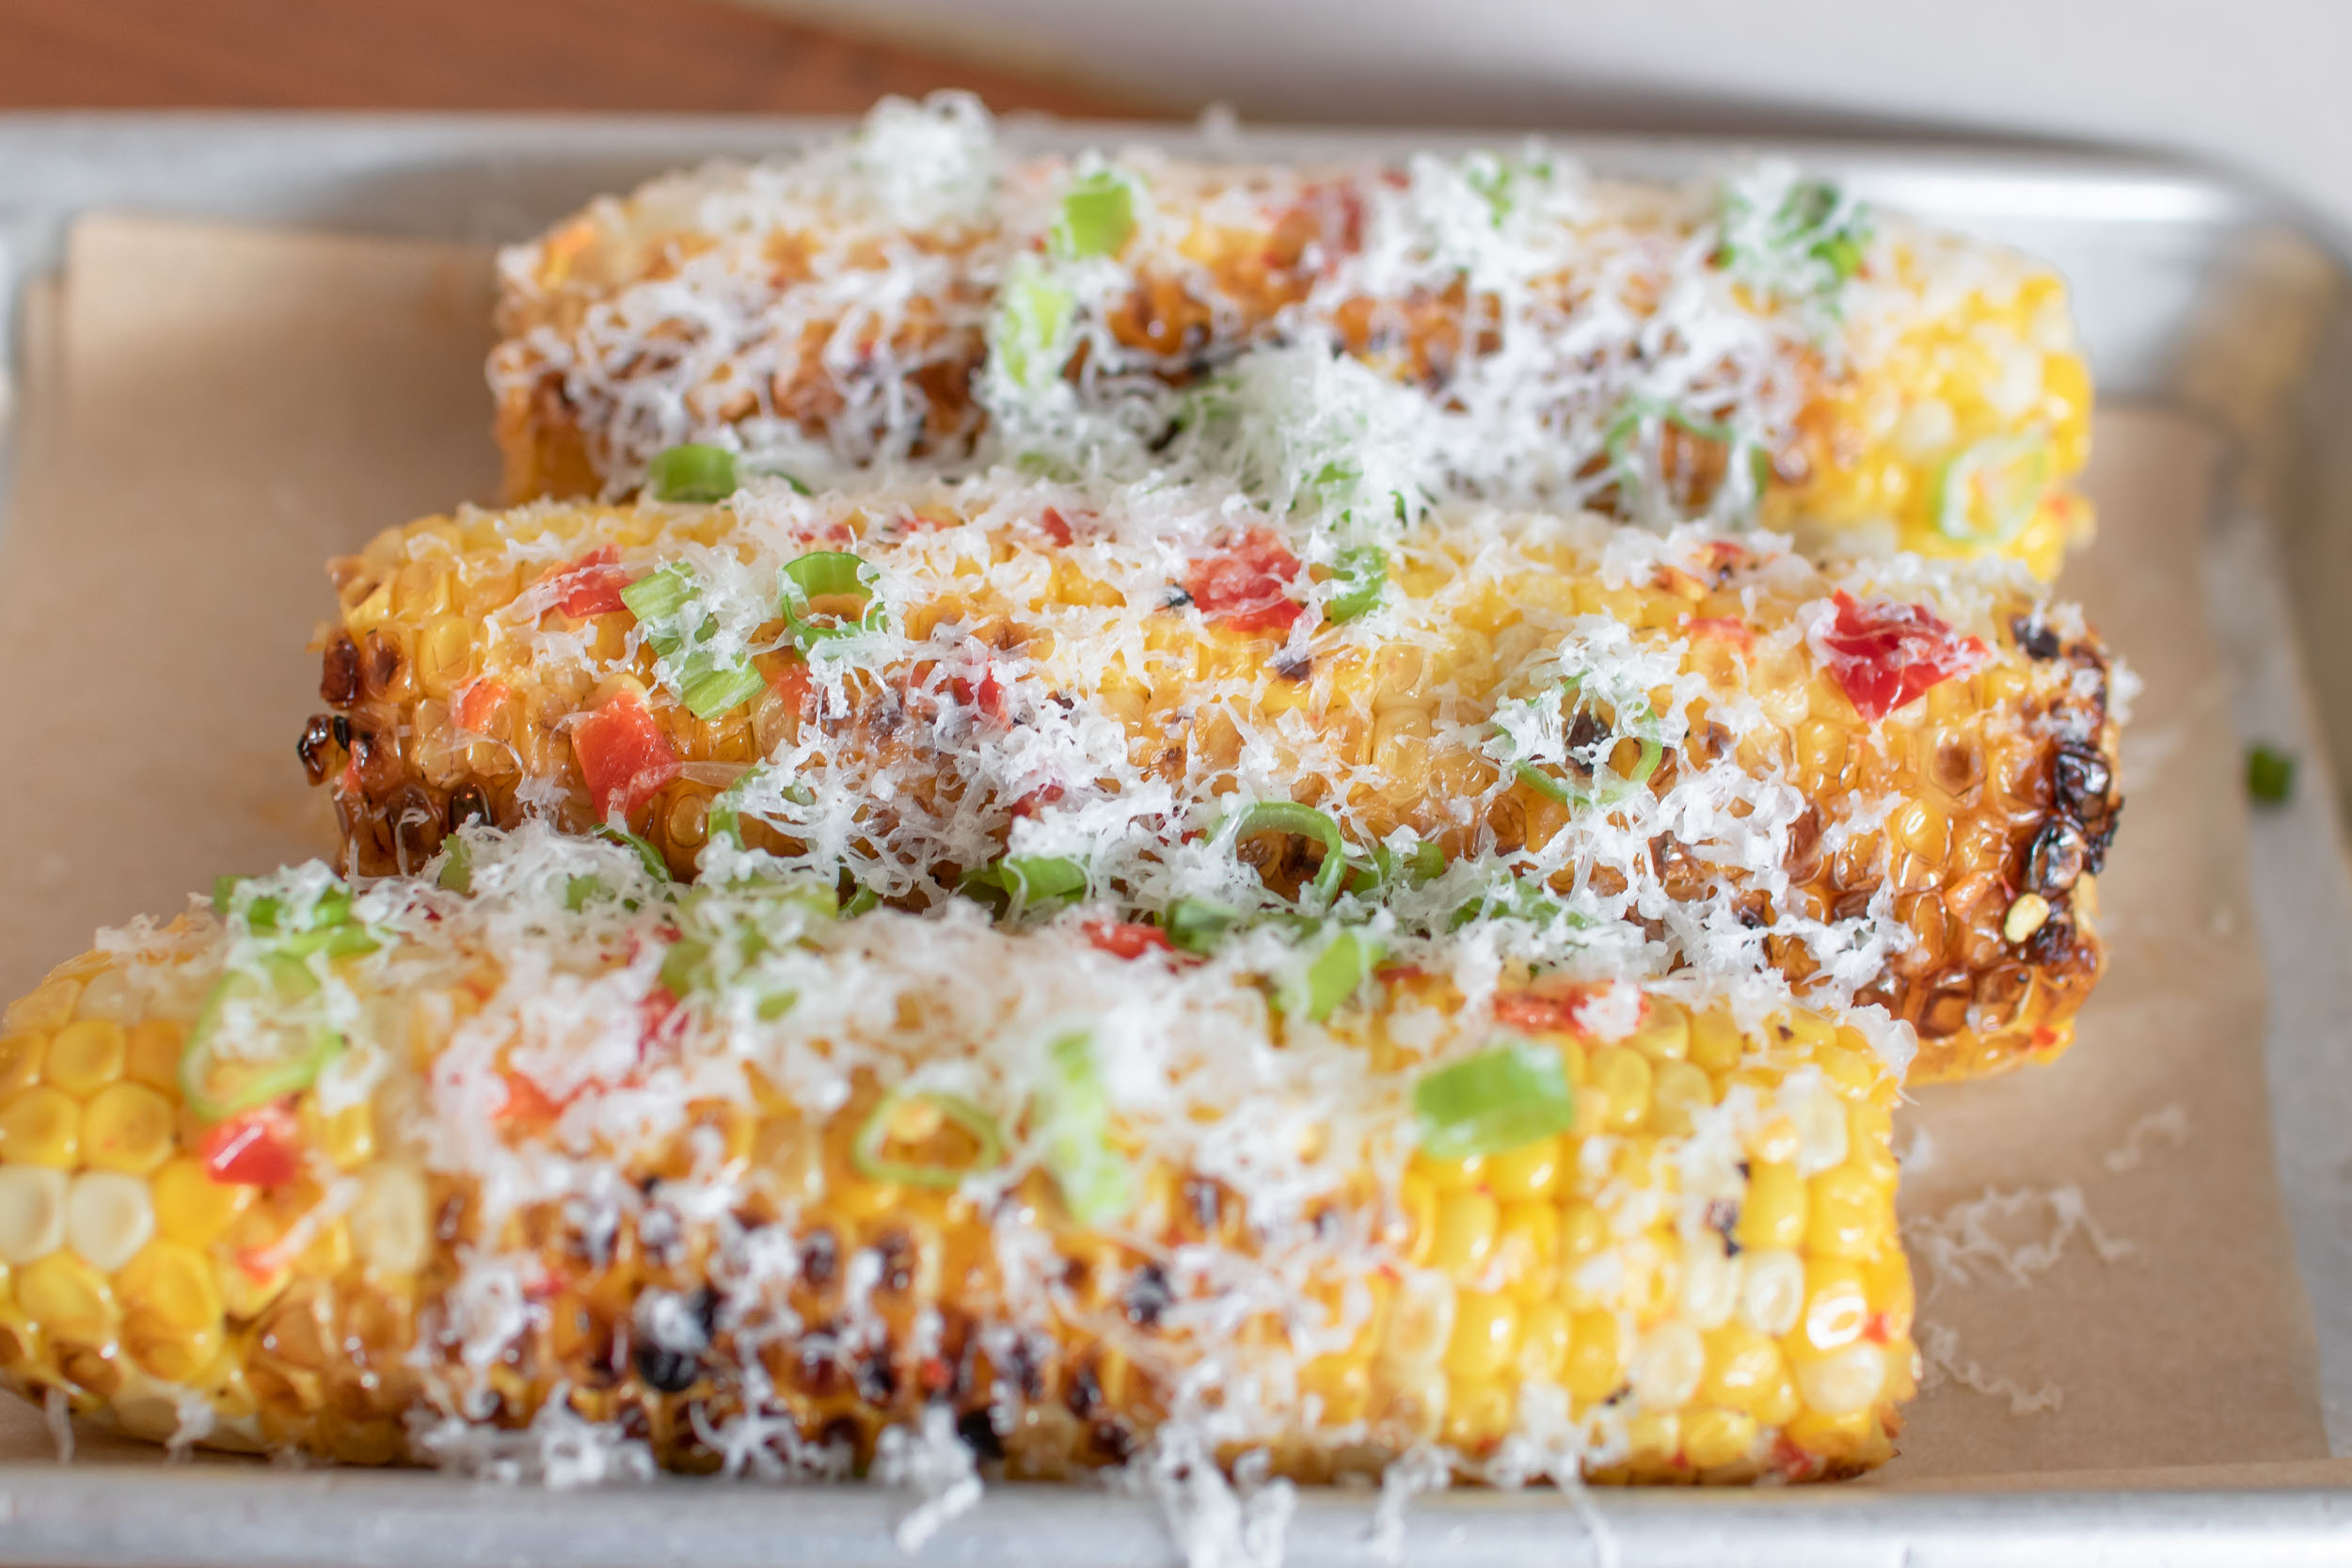 Carl Dooley's Grilled Street Corn